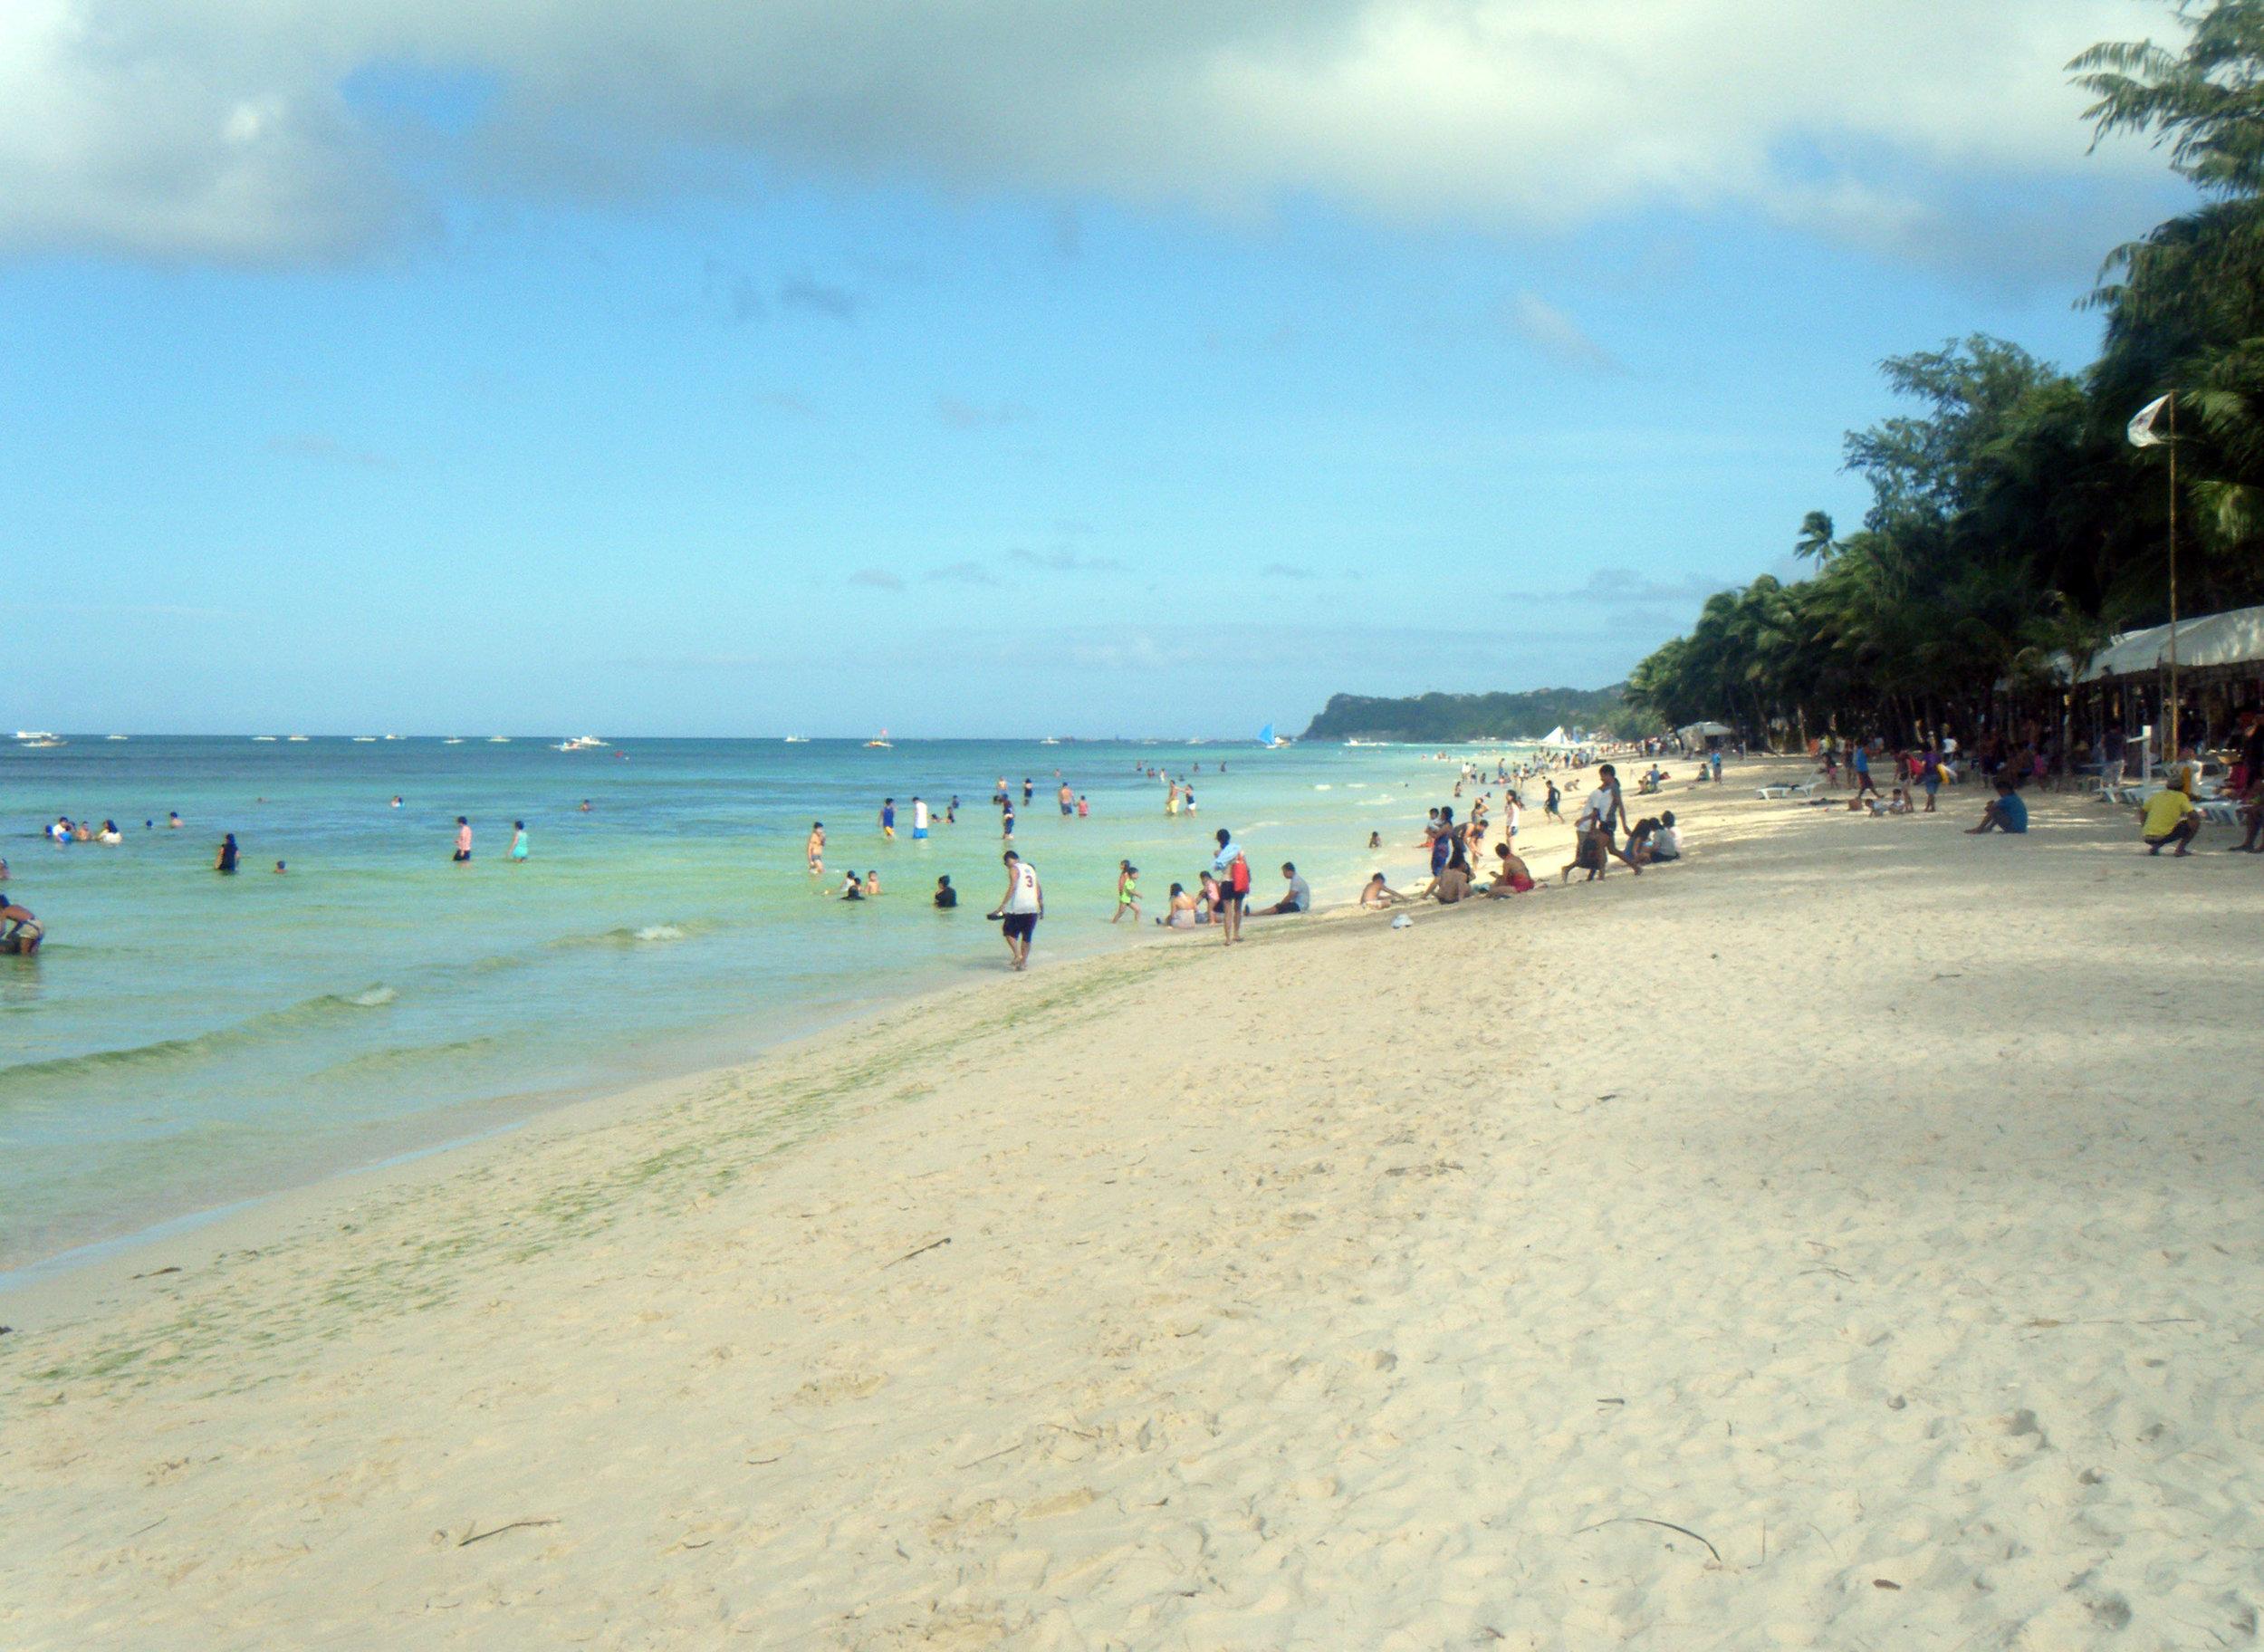 White Beach Boracay 2-24-13.jpg